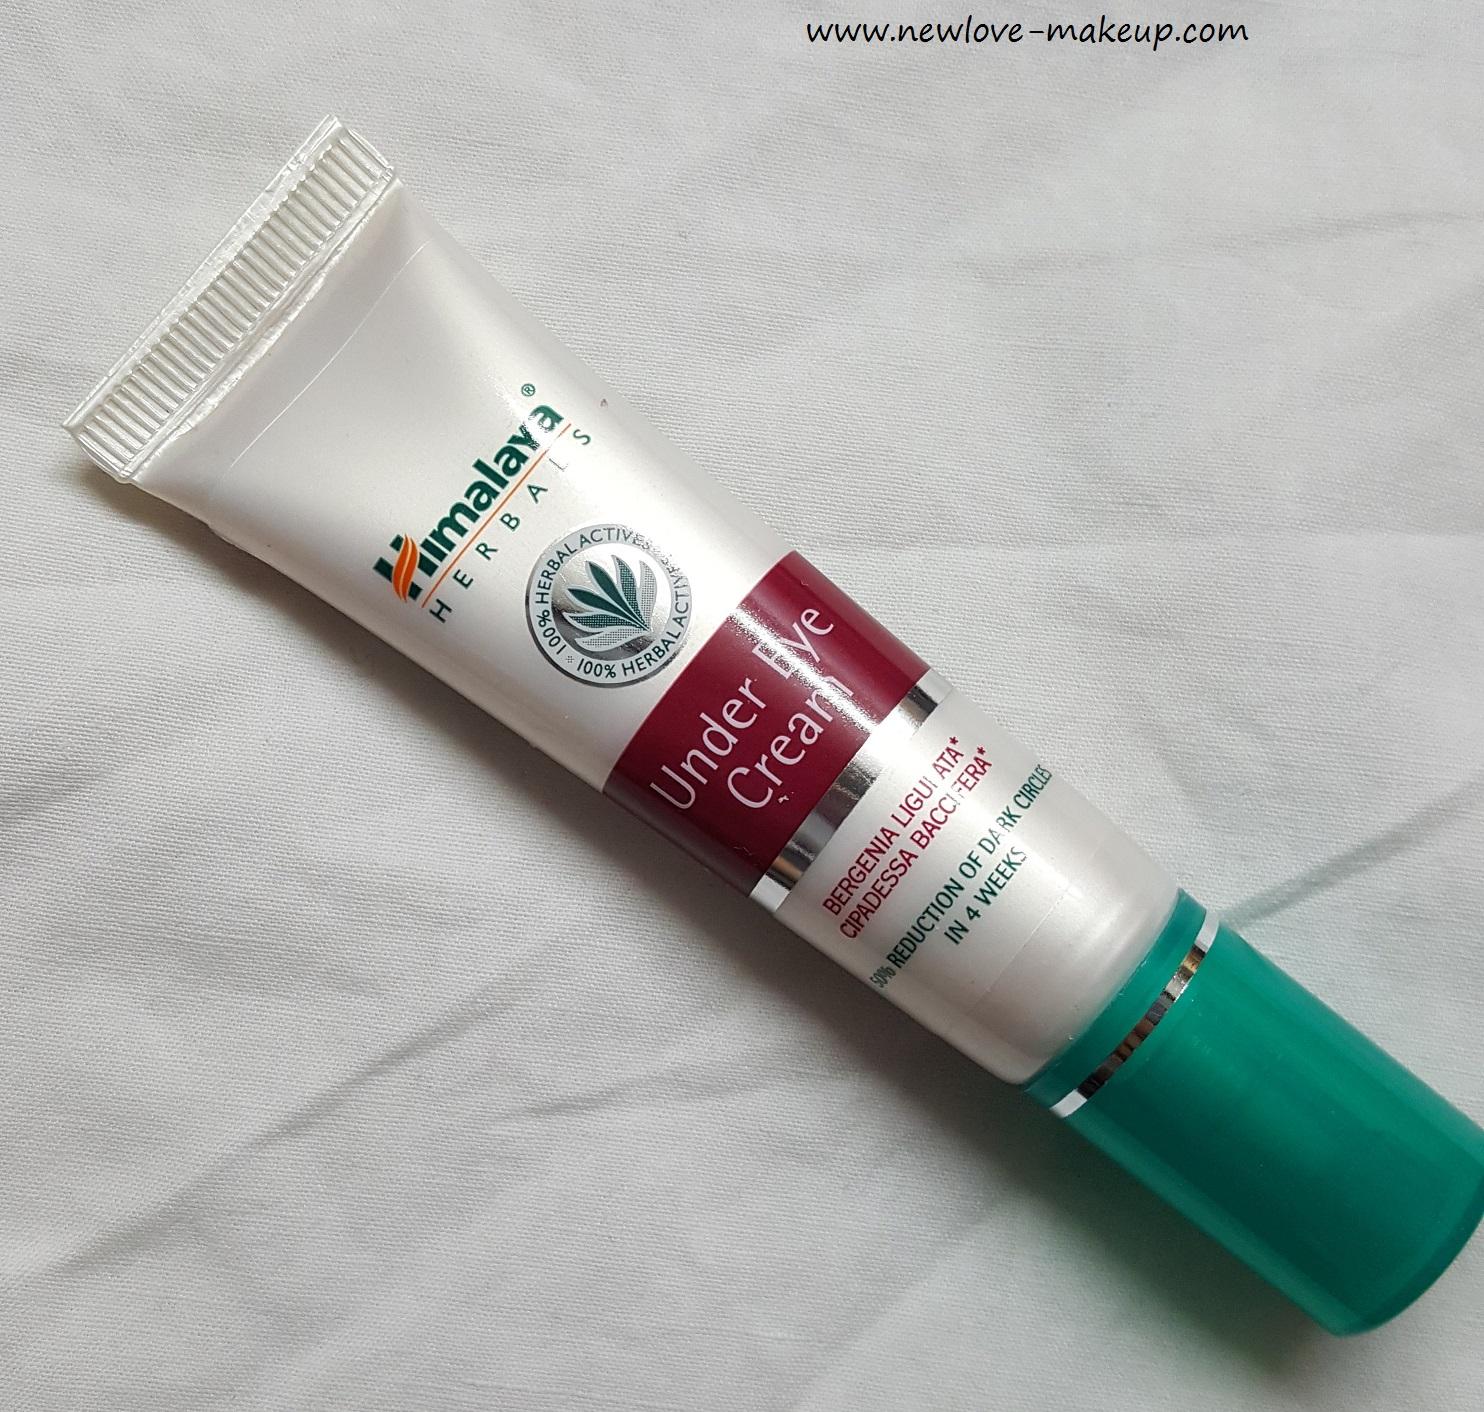 Himalaya Herbals Under Eye Cream Review New Love Makeup